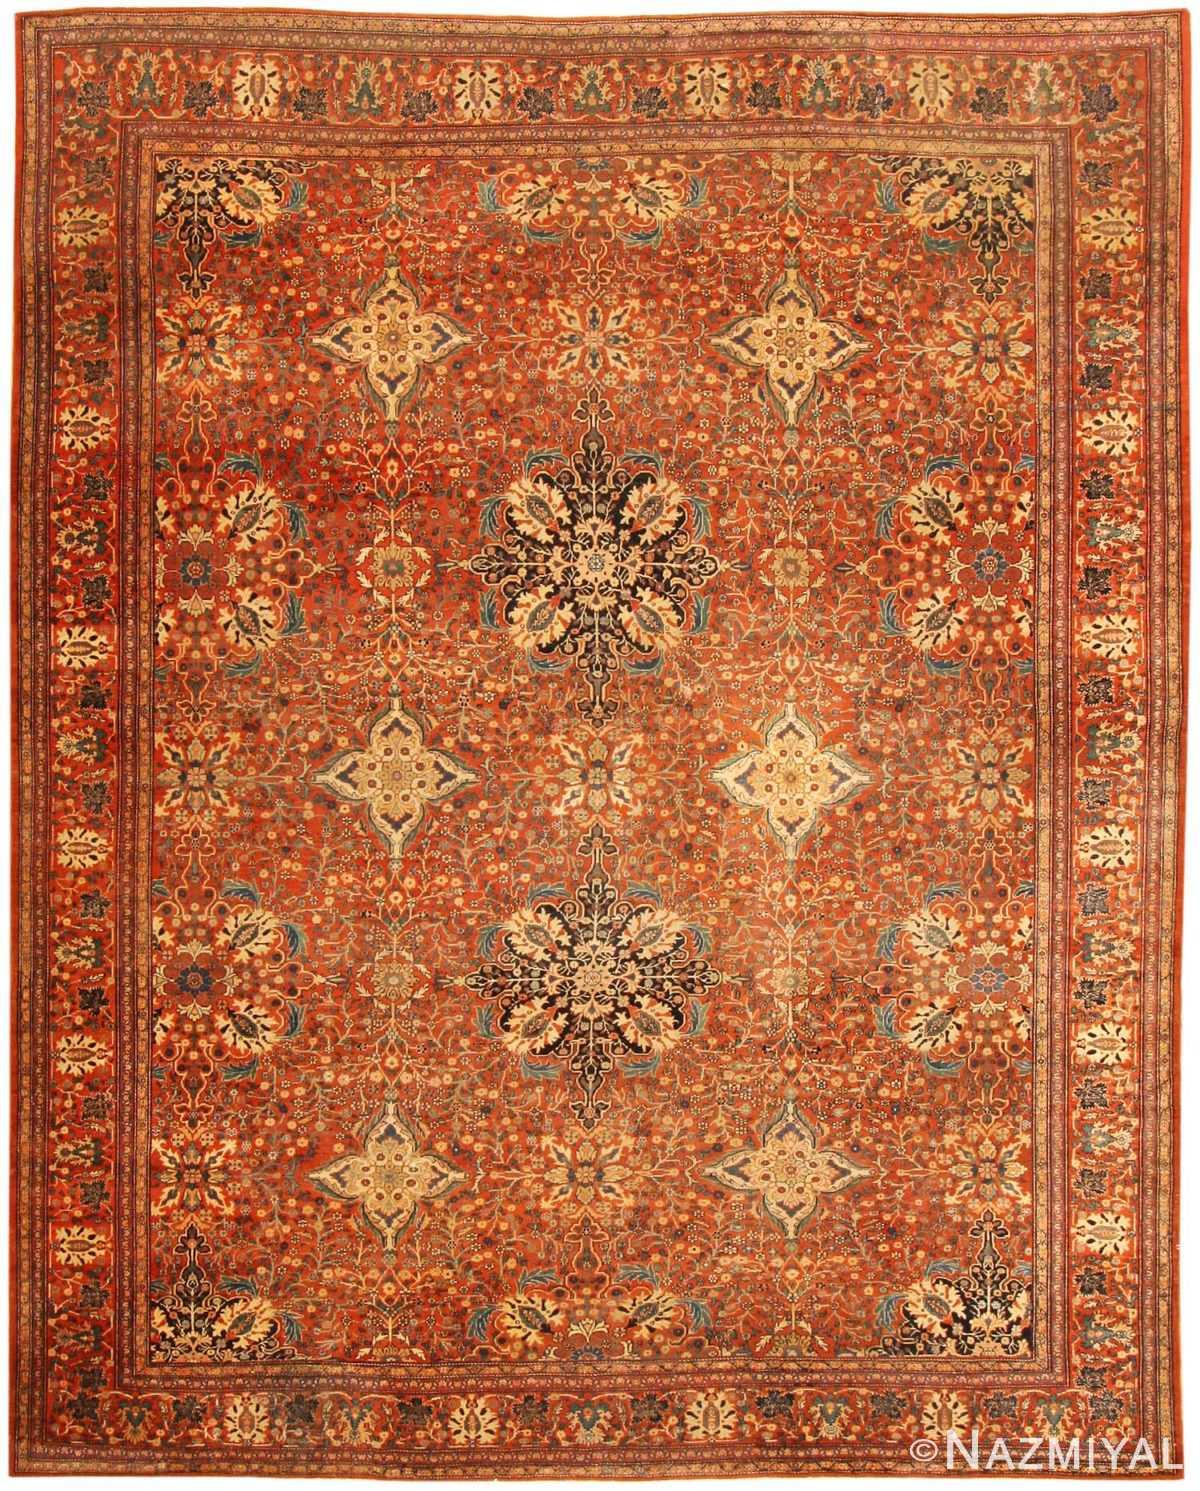 Vintage Persian Rugs: Antique Sarouk Farahan Rug 43353 By Nazmiyal